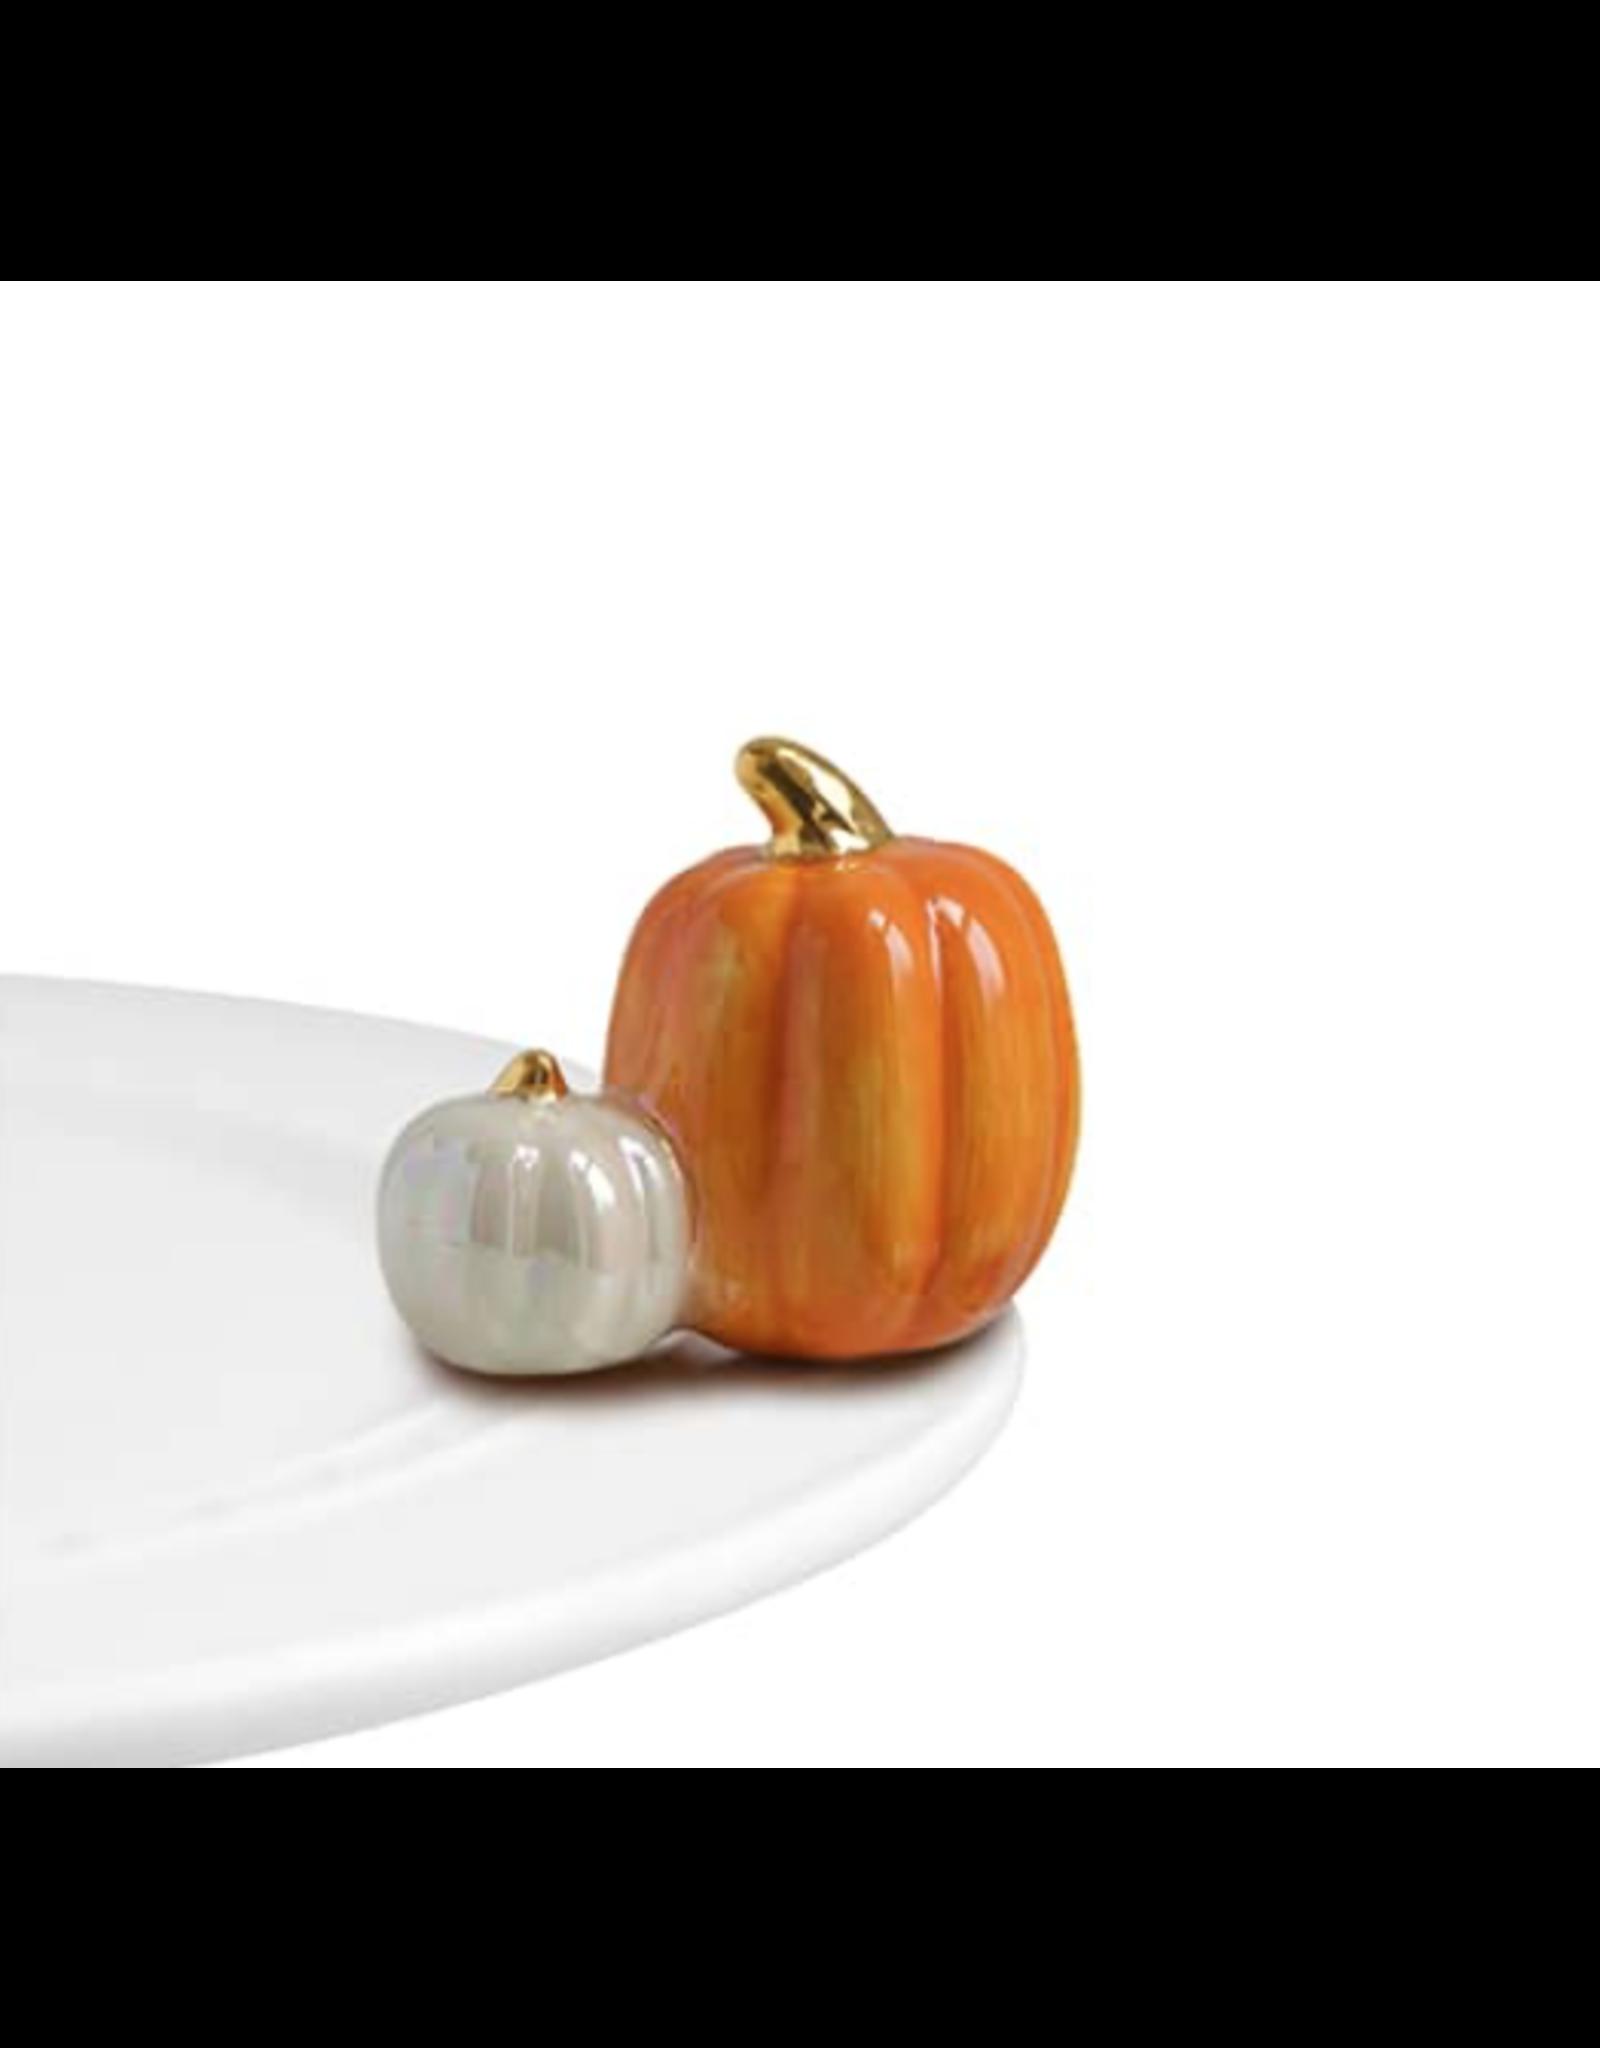 Nora Fleming Mini Pumpkin Spice (Orange & White Pumpkins)